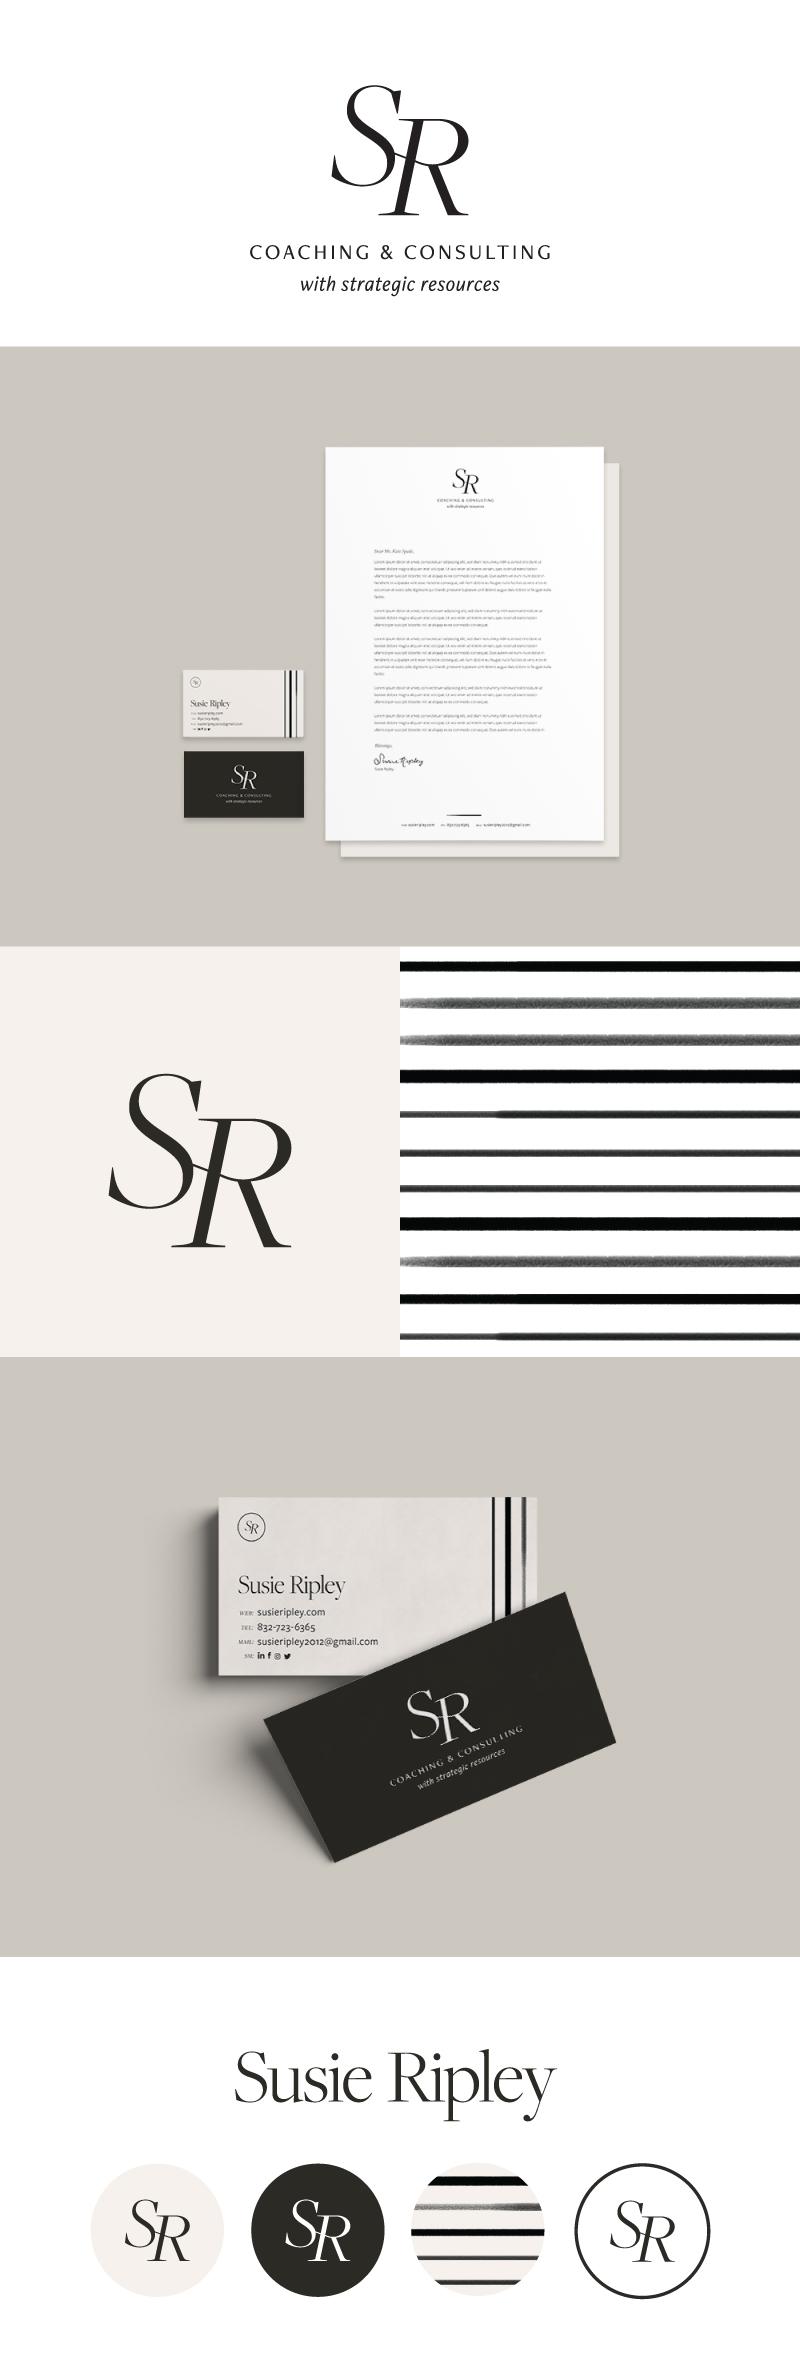 Susie-Ripley-Brand-Identity.jpg